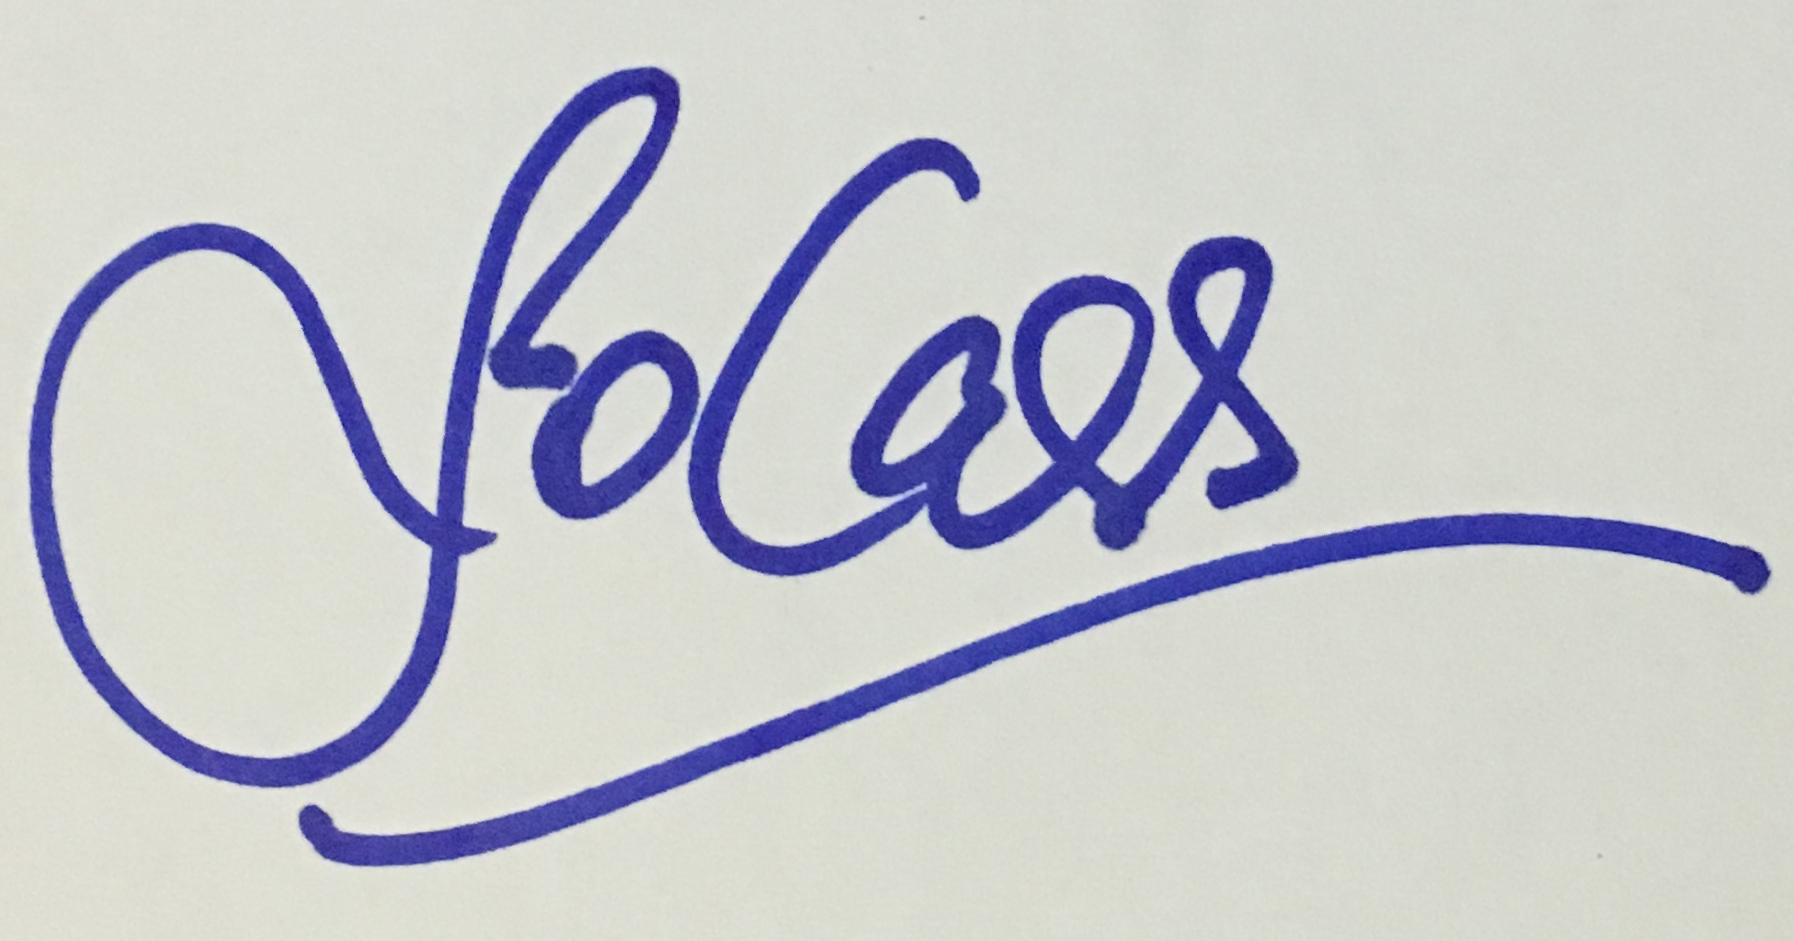 Jo Cass Signature